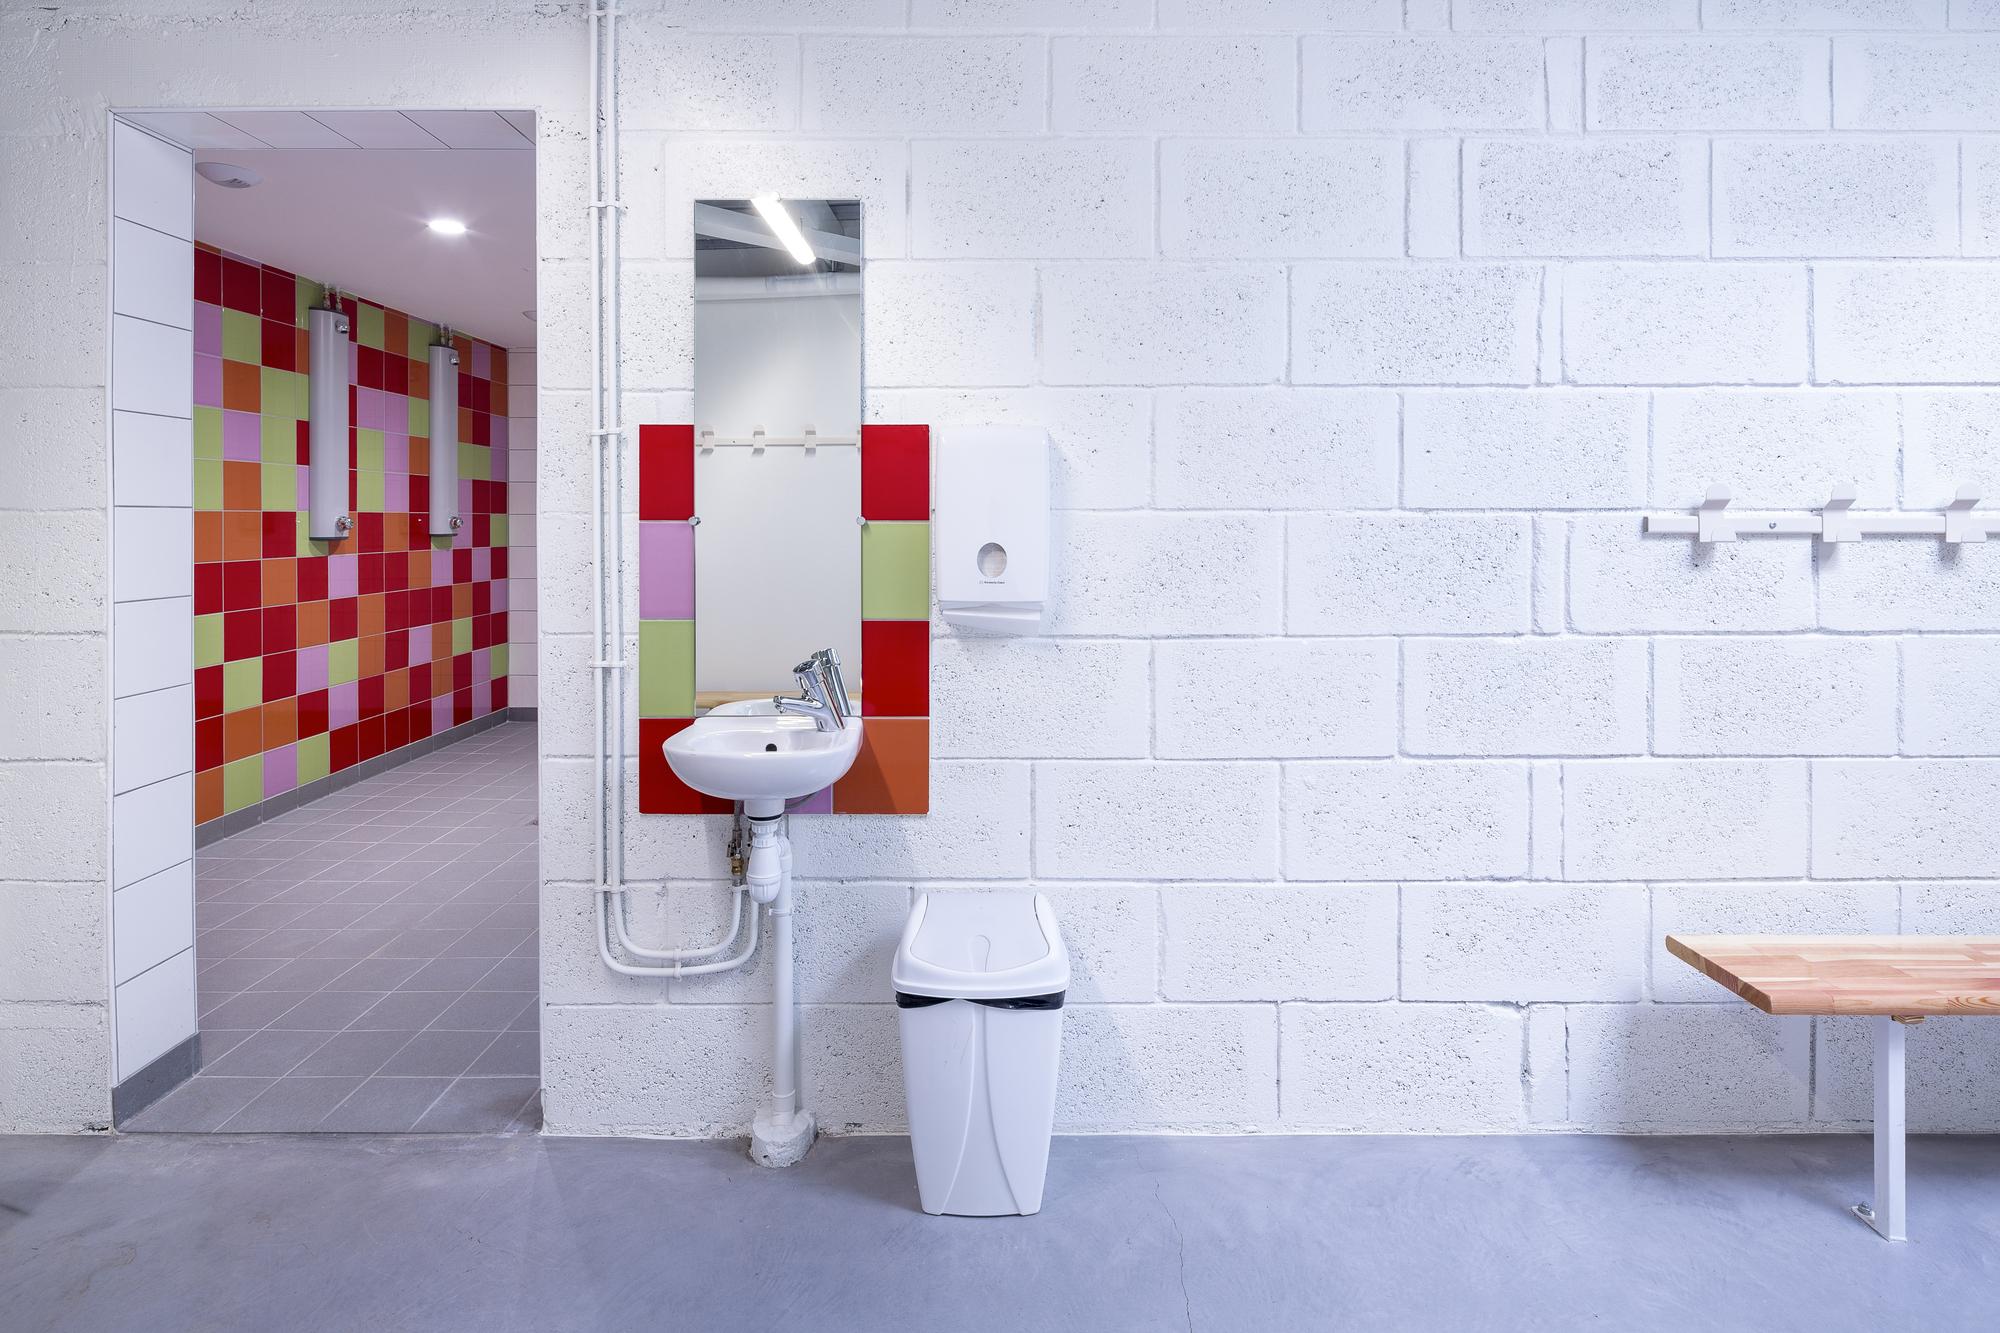 galer a de gym enoseis eno architectes 19. Black Bedroom Furniture Sets. Home Design Ideas